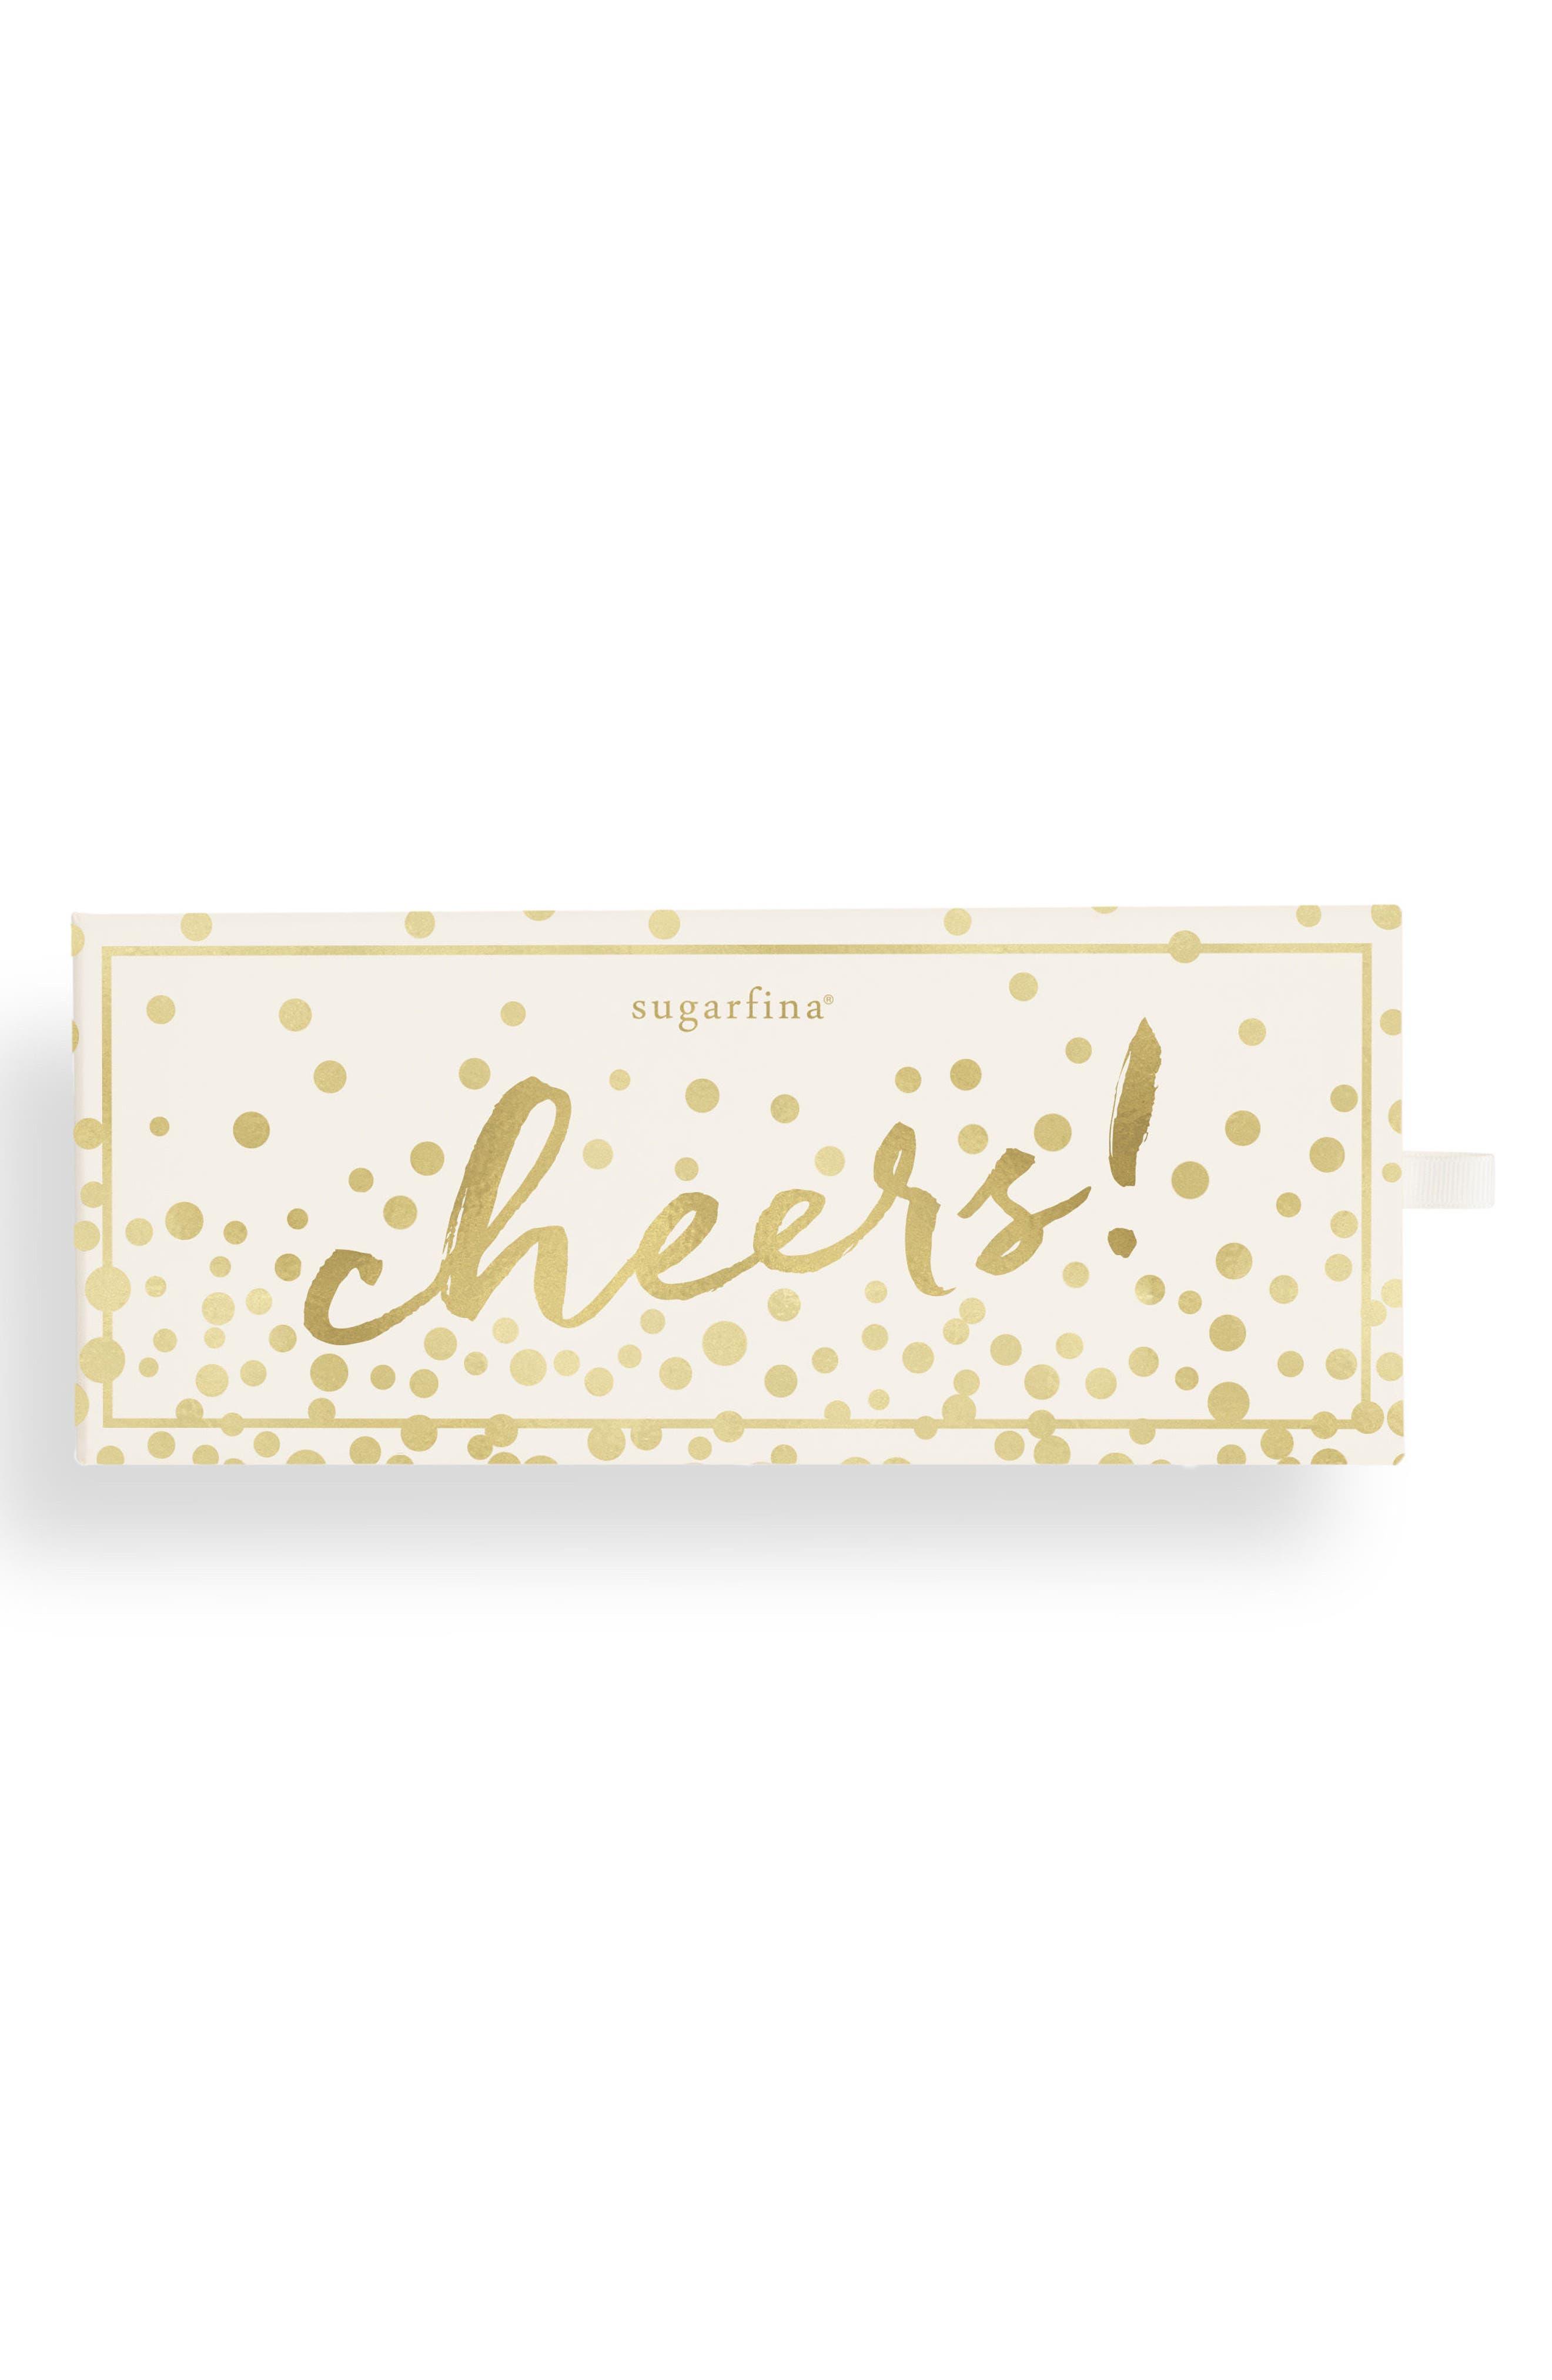 Cheers 3-Piece Candy Bento Box,                         Main,                         color, 100